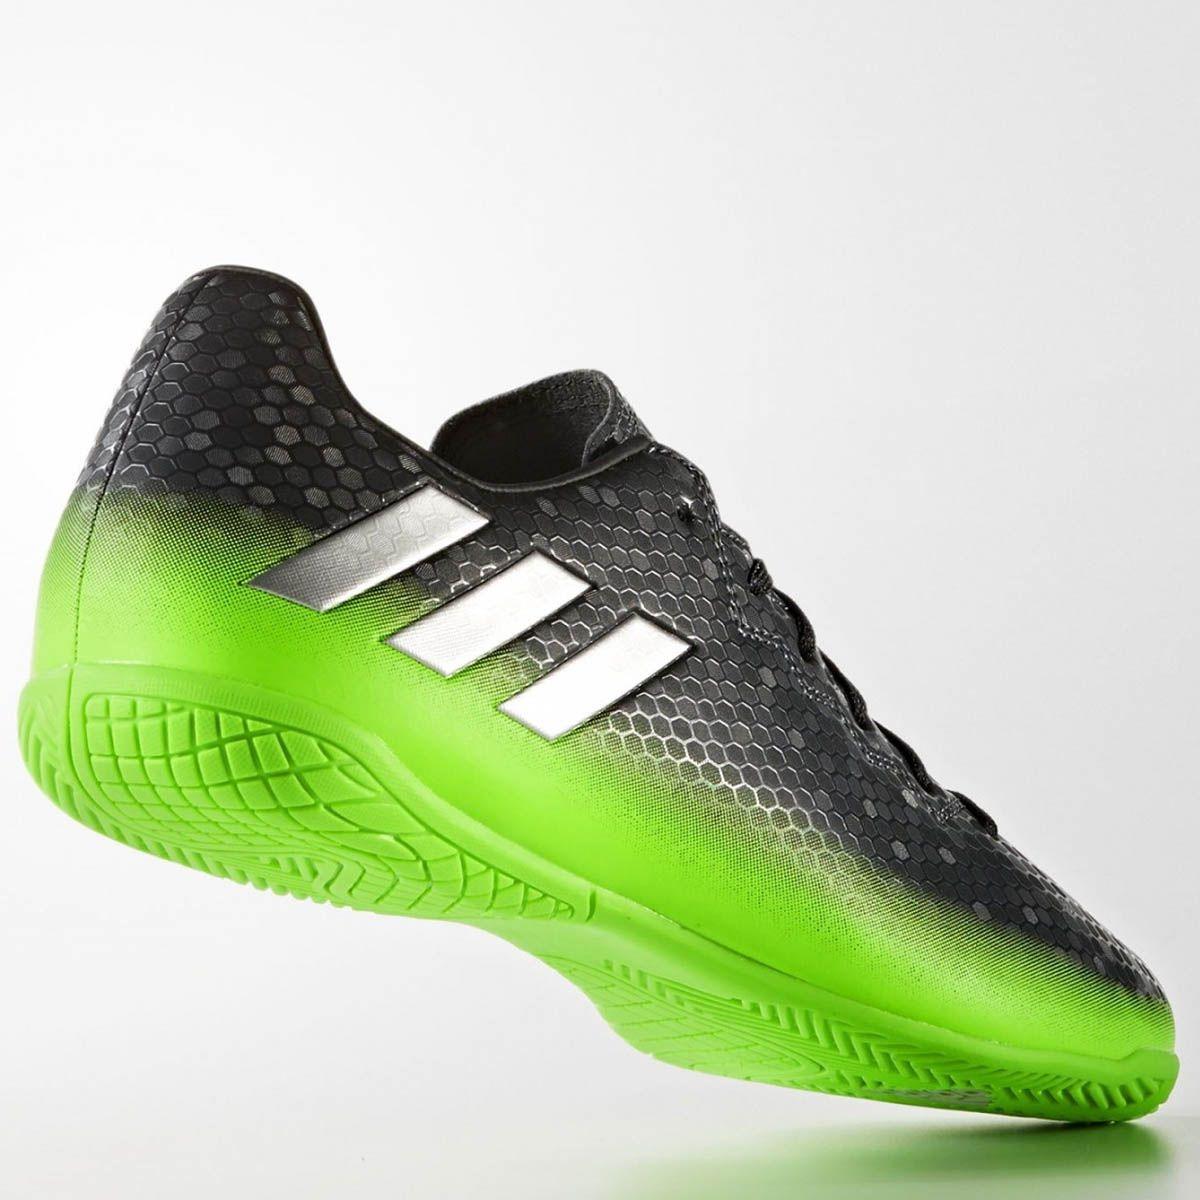 315bb43307 tênis de futsal chuteira adidas messi 16.4 in original +nf. Carregando zoom.